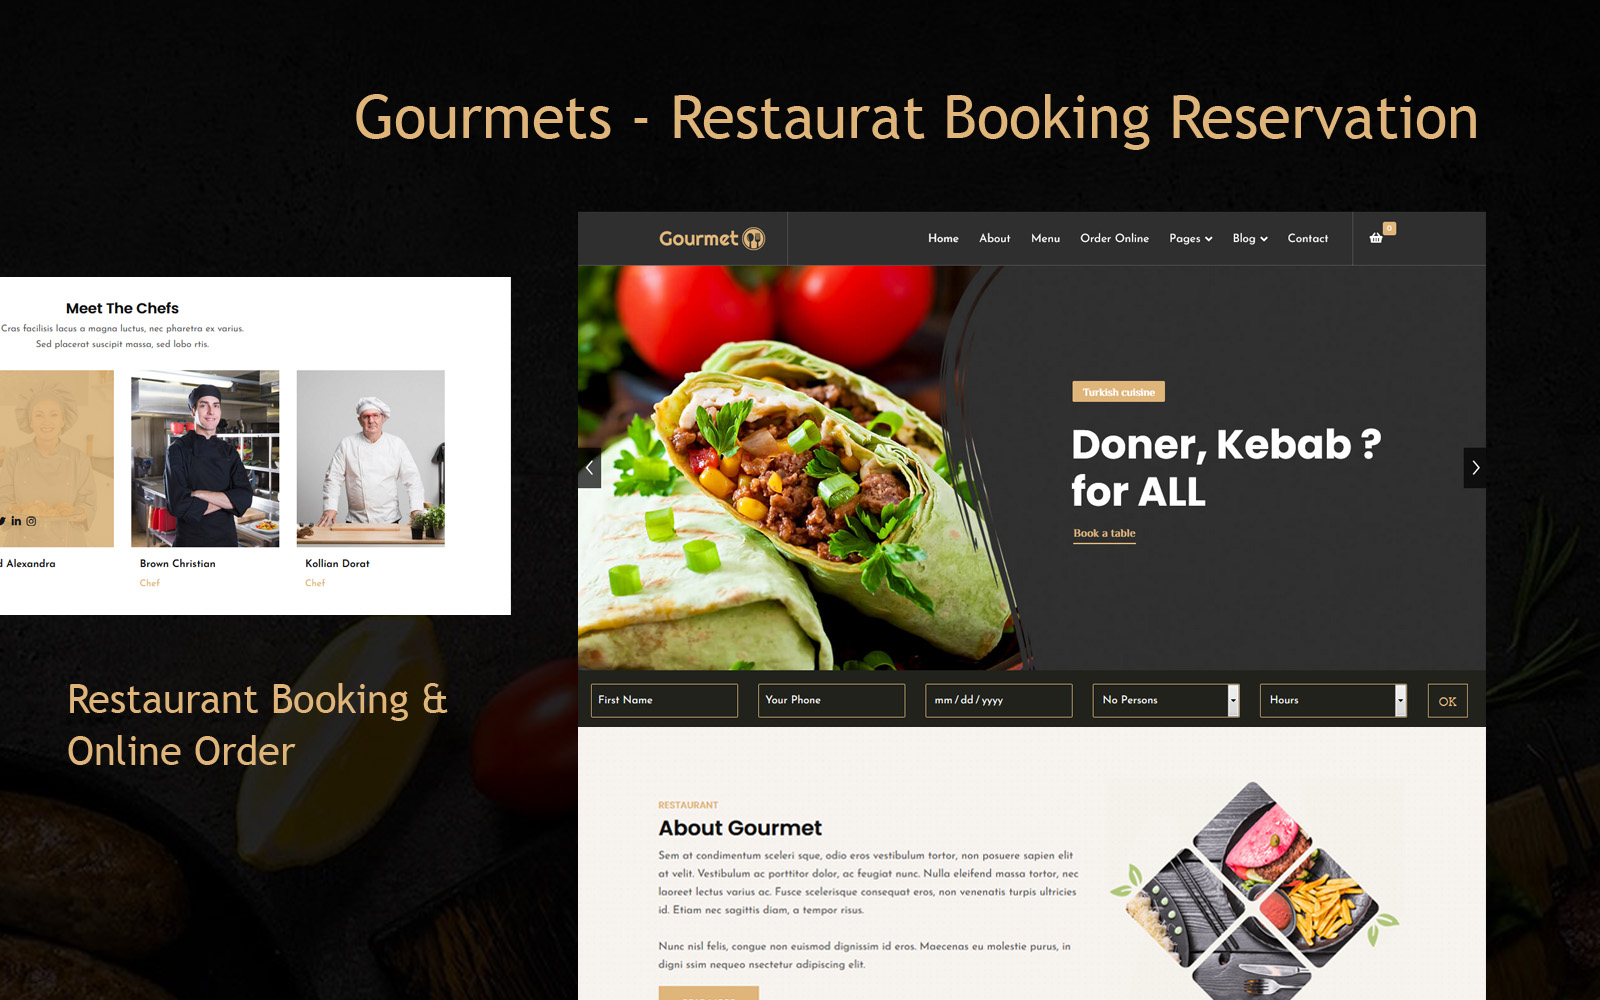 Responsywny szablon Joomla Gourmets - Restaurat Booking Reservation #123376